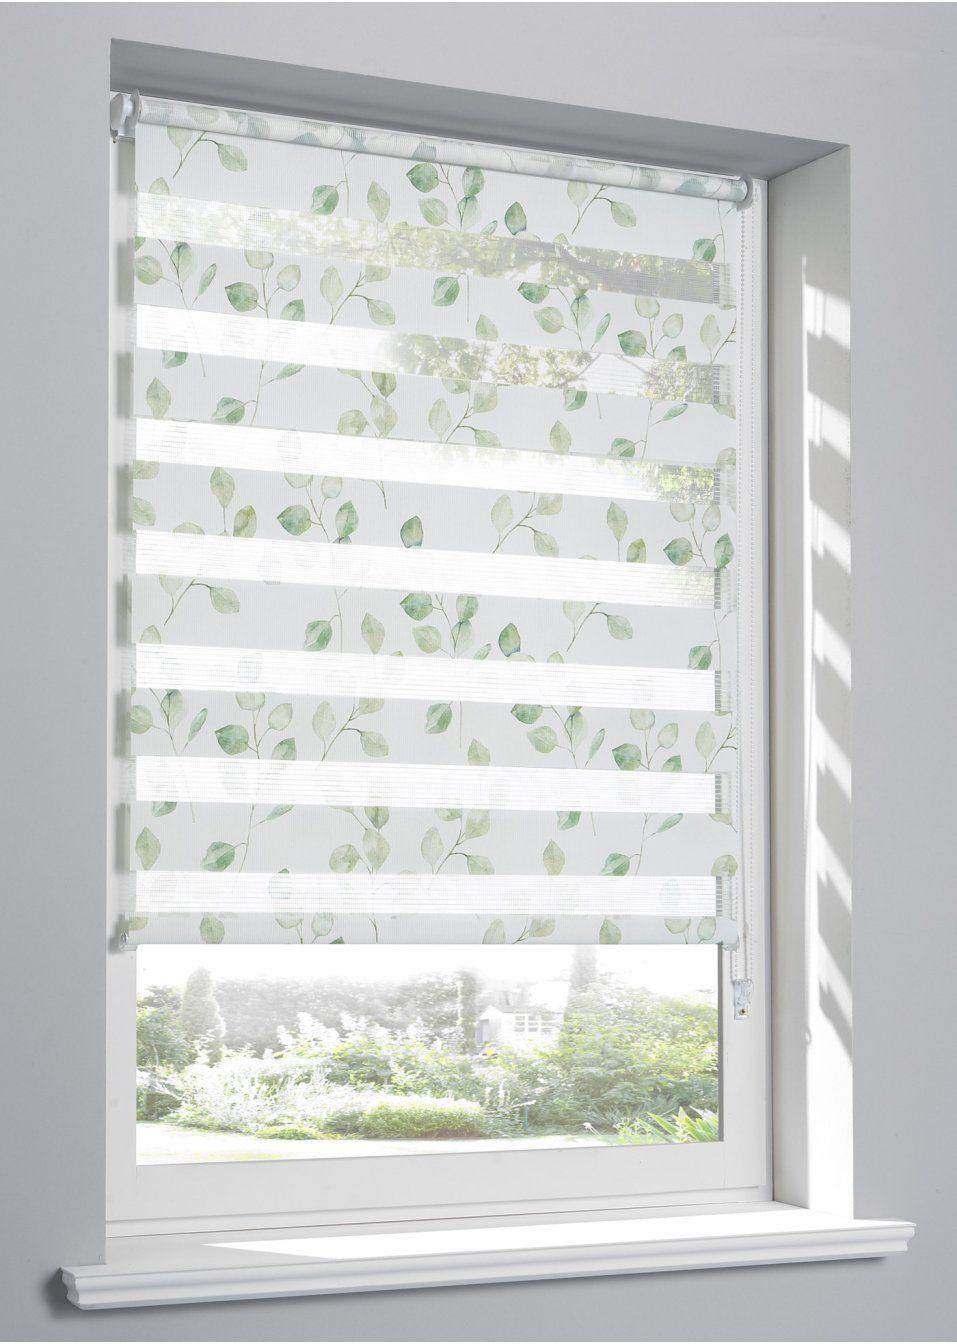 Feiner Blumen Ranken Druck Weiss Grun Klemmtrager Fensterrahmen Kettenzug Weiss